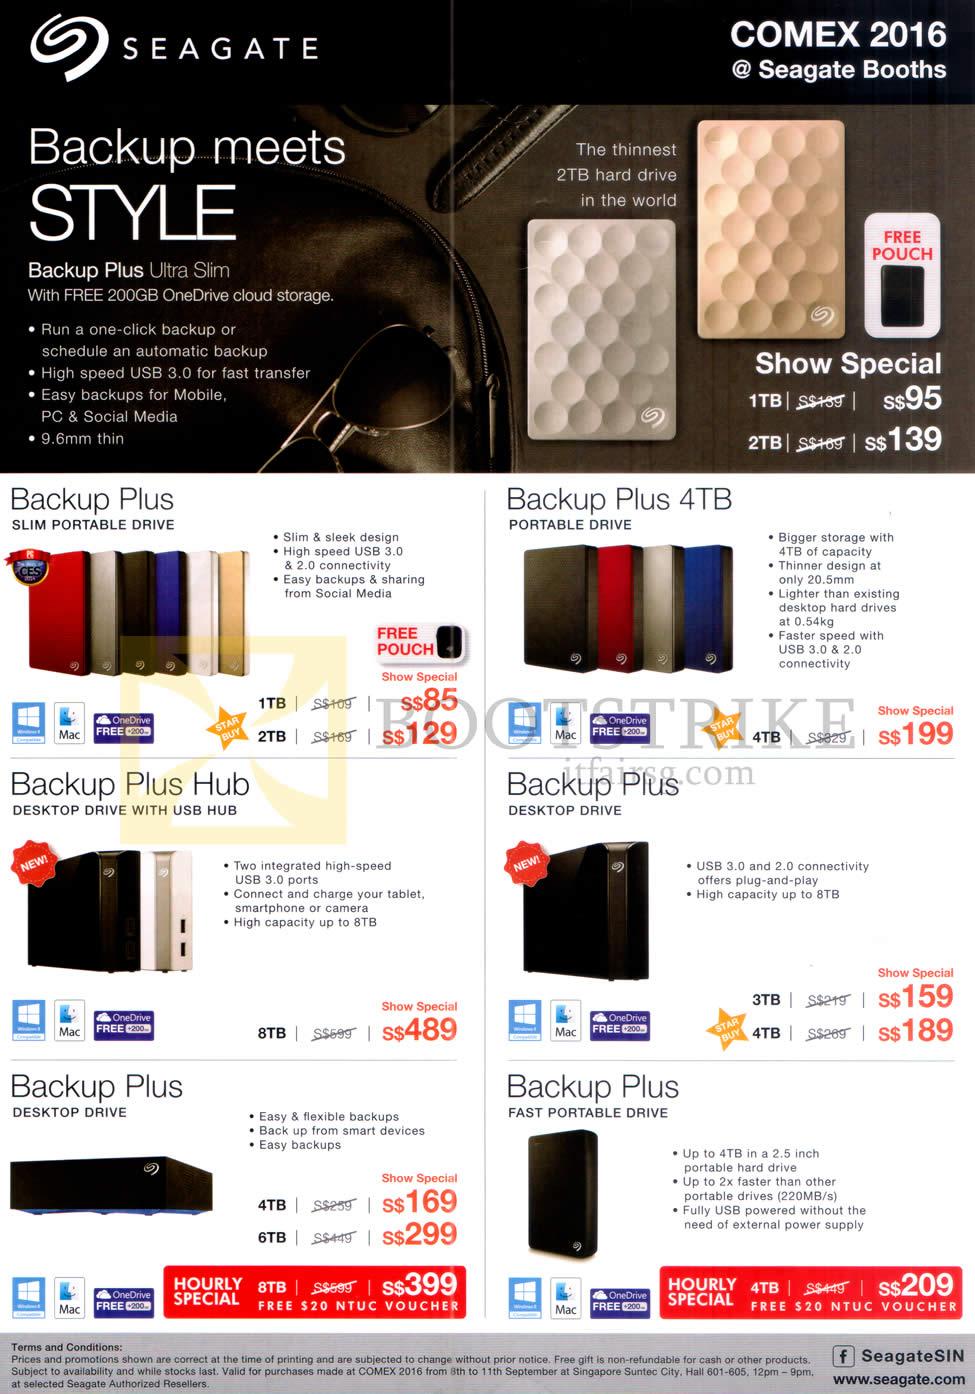 COMEX 2016 price list image brochure of Seagate External Storage Drive Backup Plus, 4TB, Hub, Desktop Drive, Fast Portable Drive, 1TB, 2TB, 3TB, 4TB, 6TB, 8TB